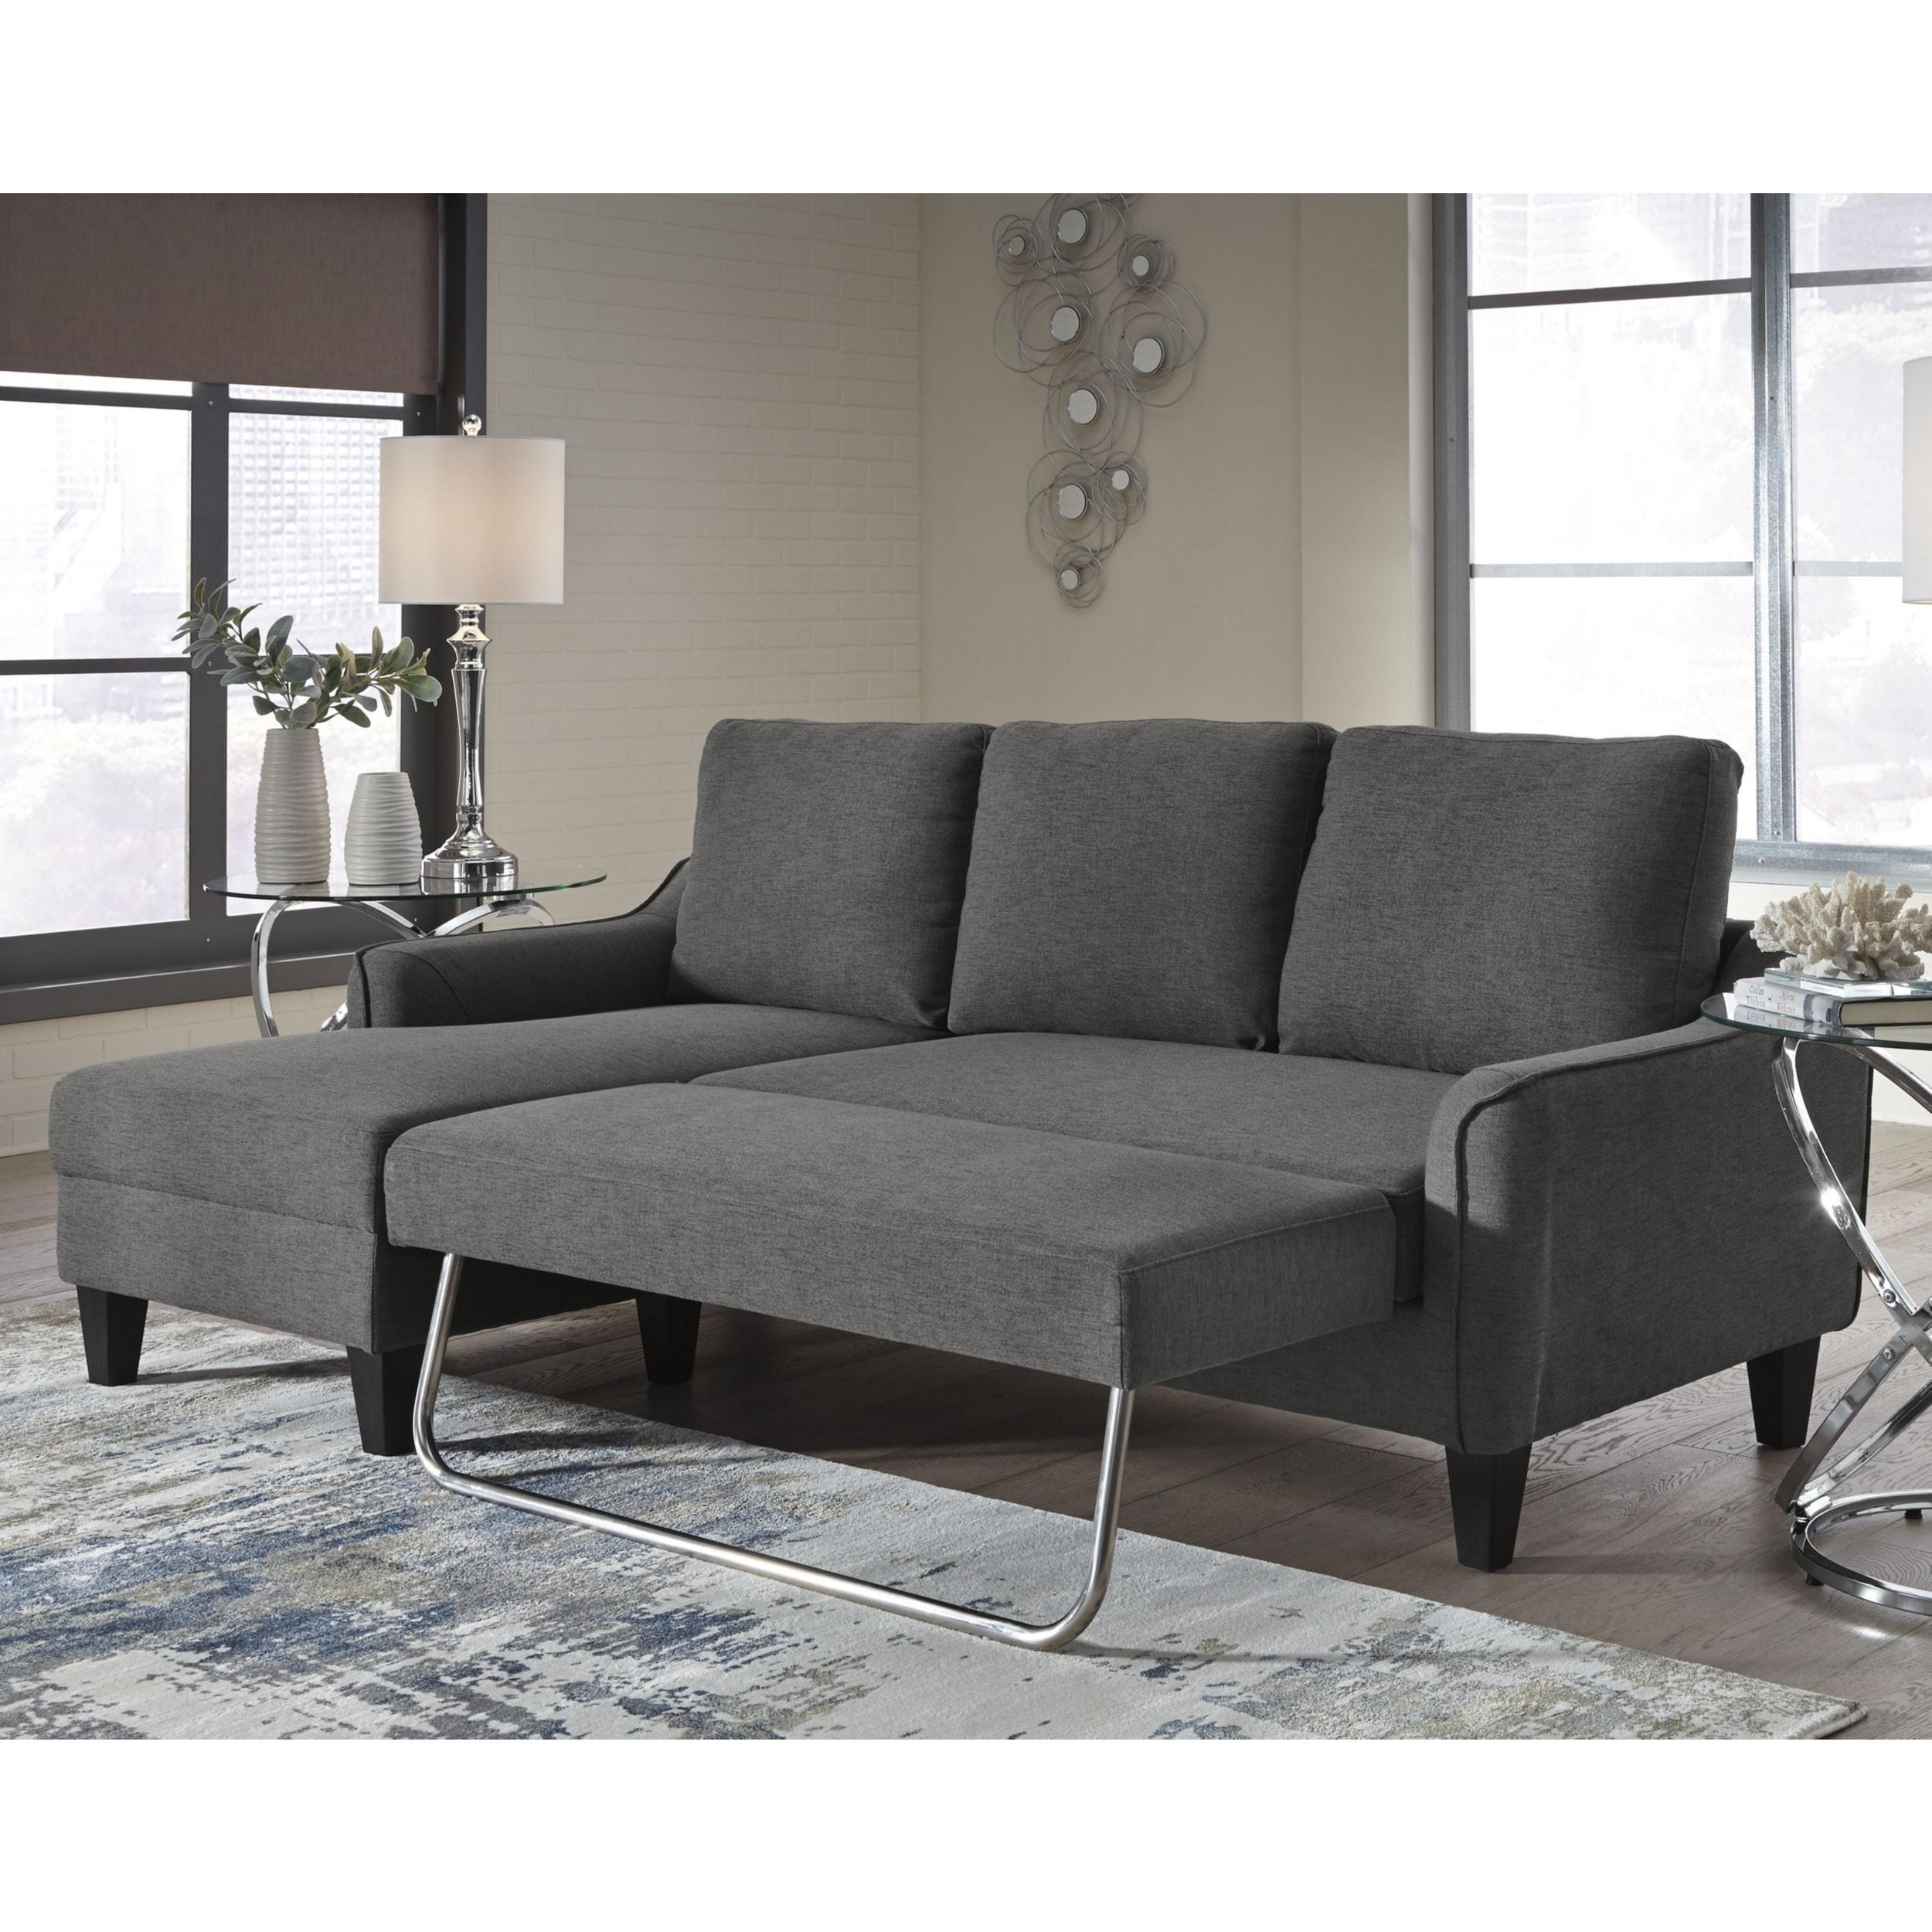 Jarreau Contemporary Gray Sofa Chaise Sleeper